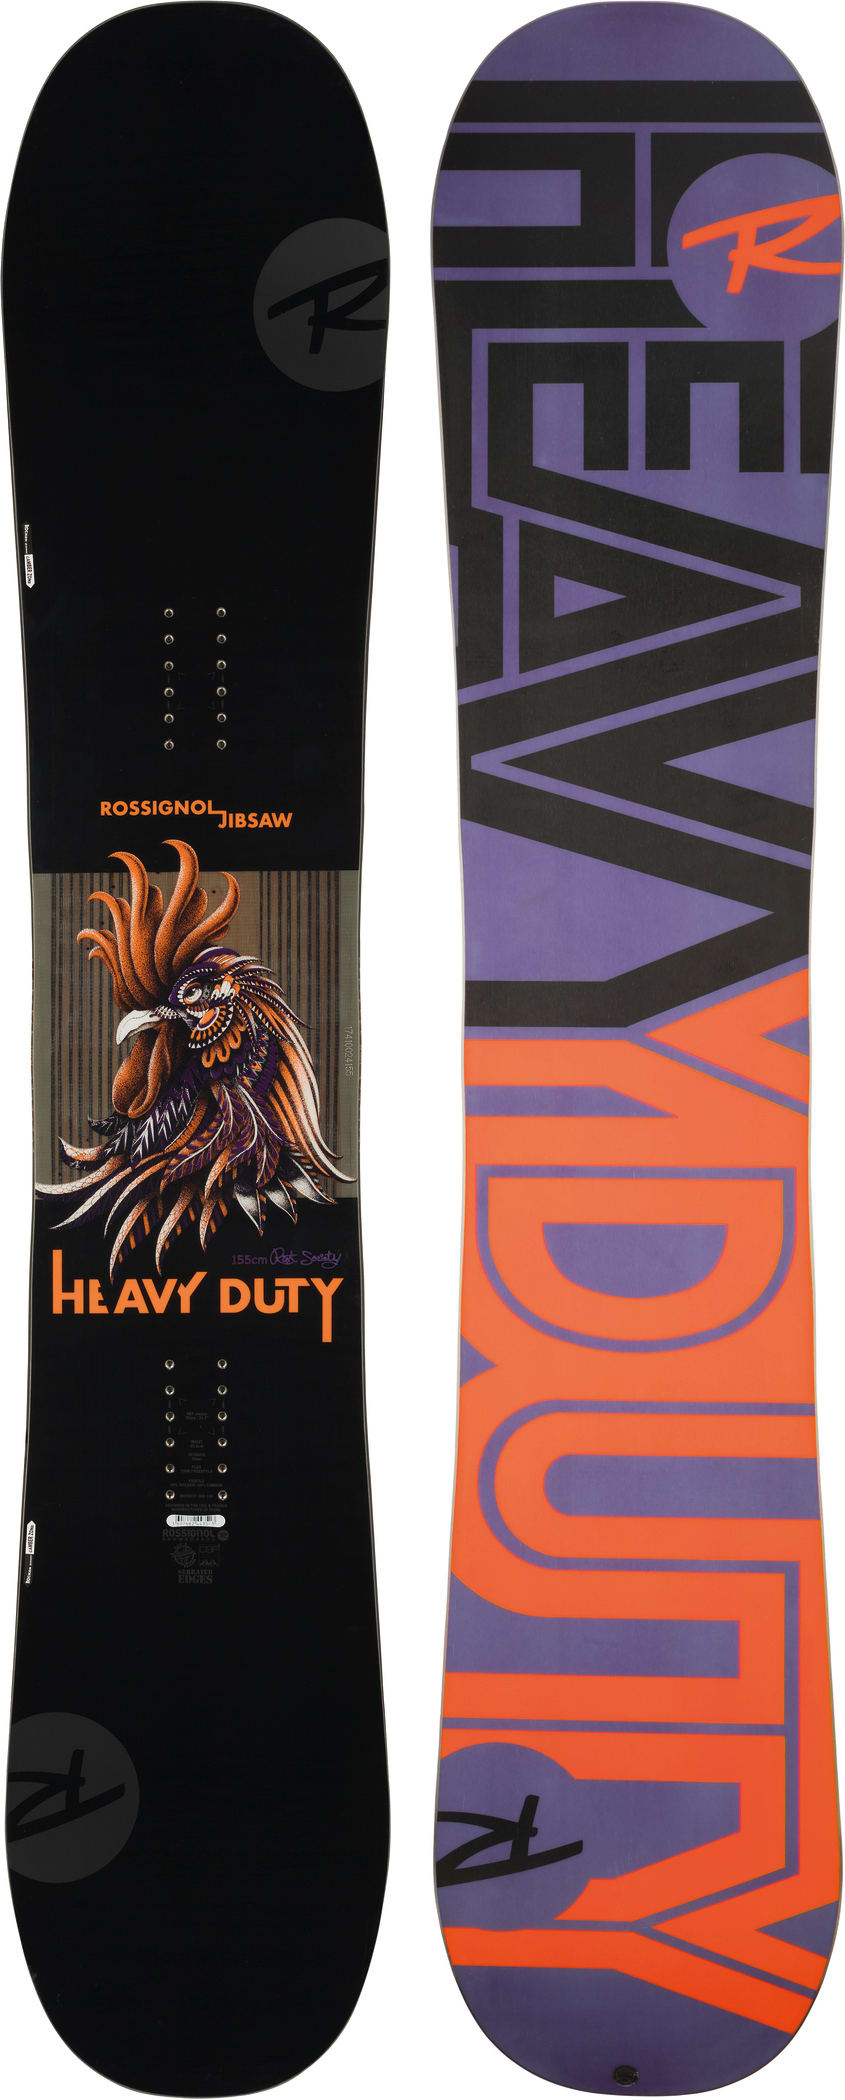 Image of Rossignol Jibsaw Heavy Duty Snowboard